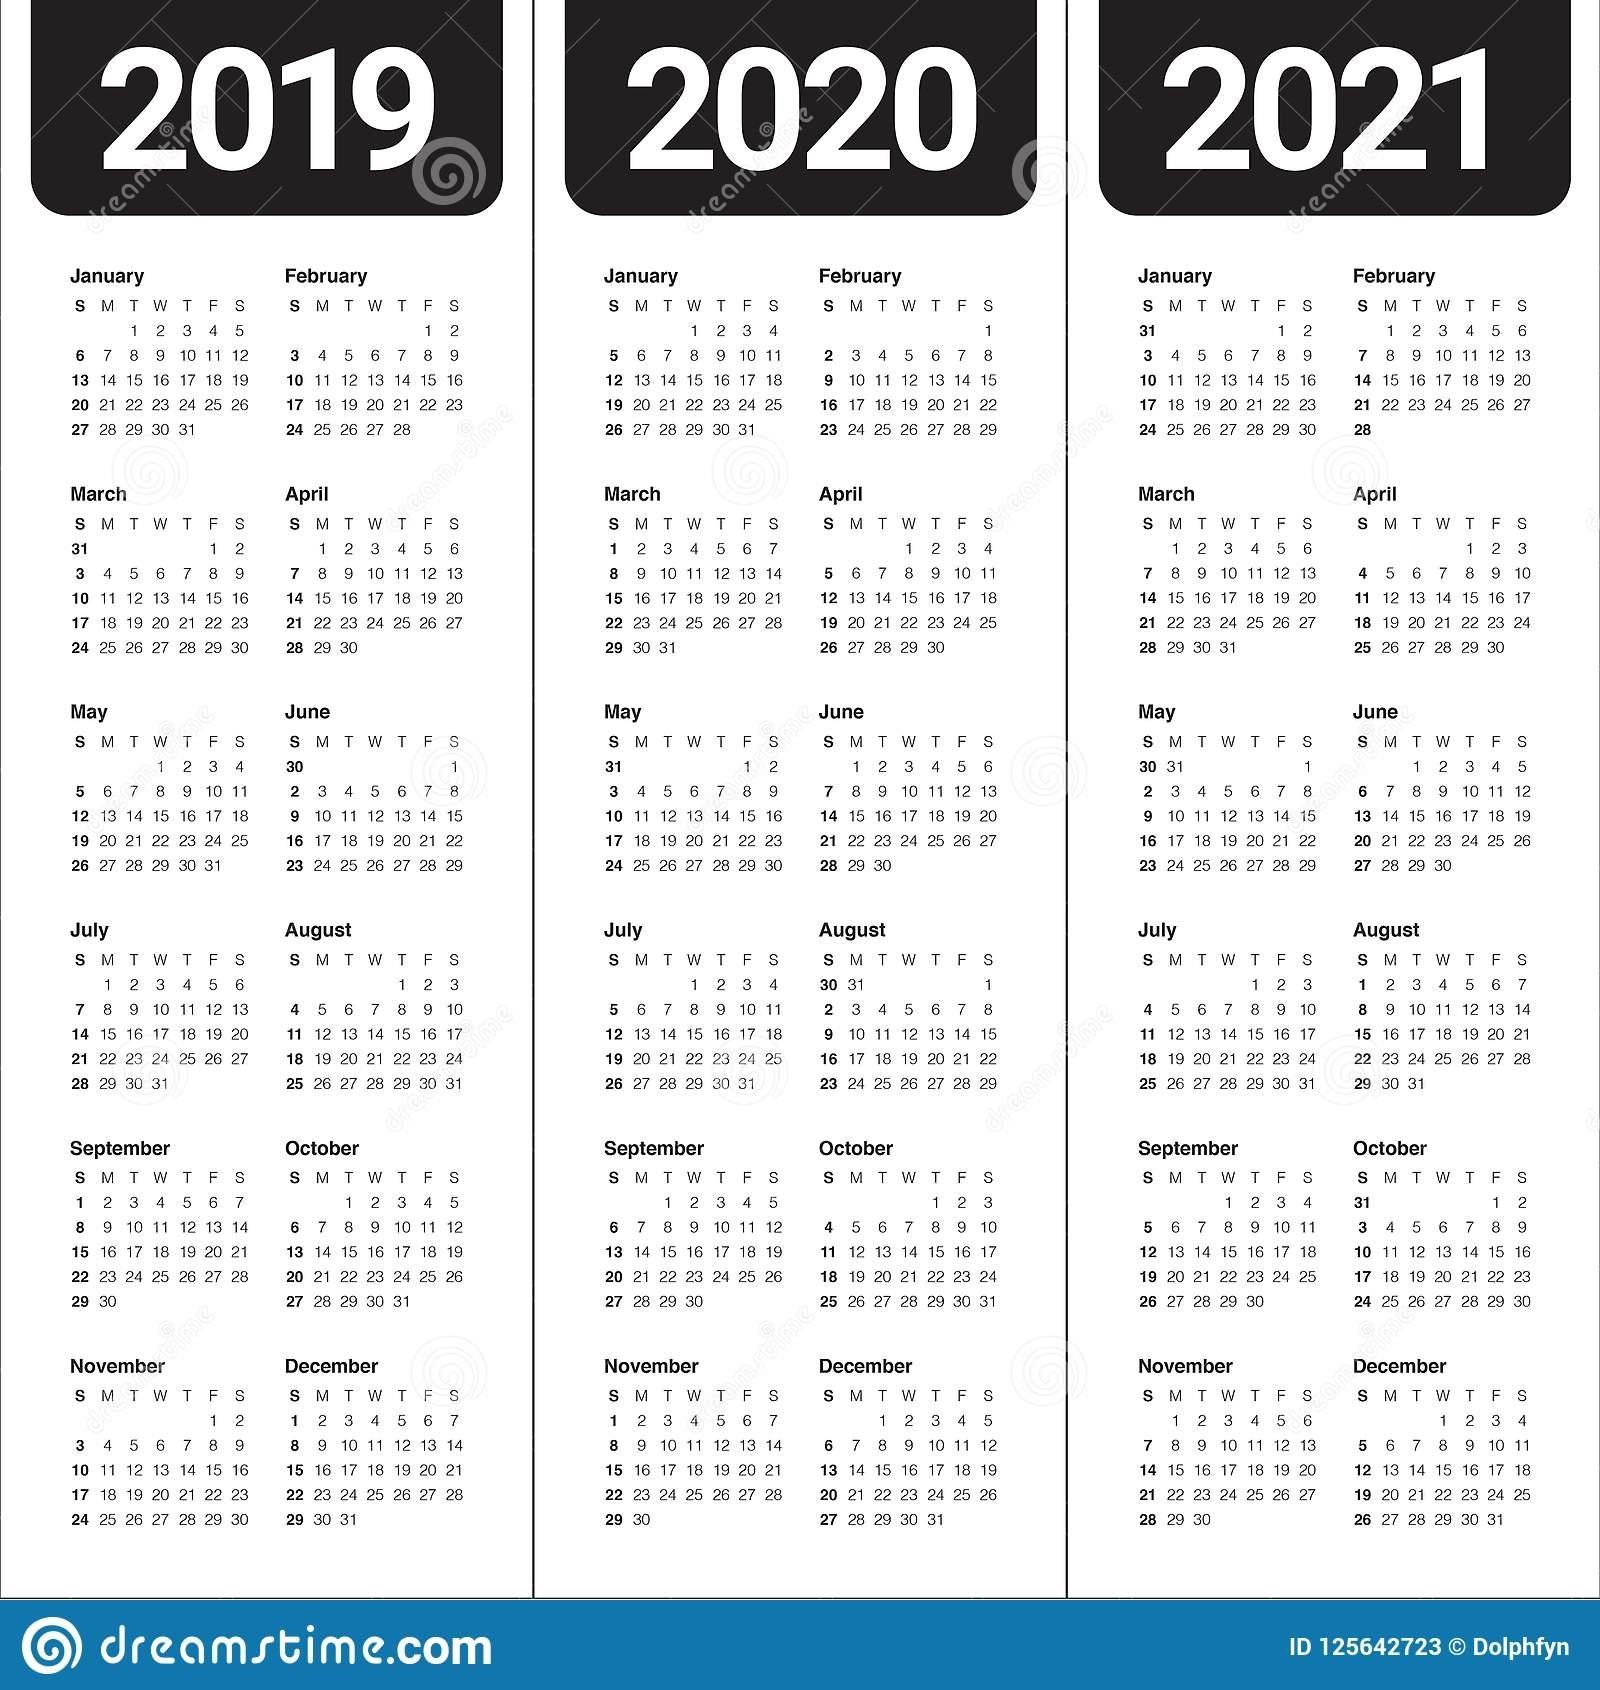 Year 2019 2020 2021 Calendar Vector Design Template Stock within Three-Year Calendar 2019 2020 2021